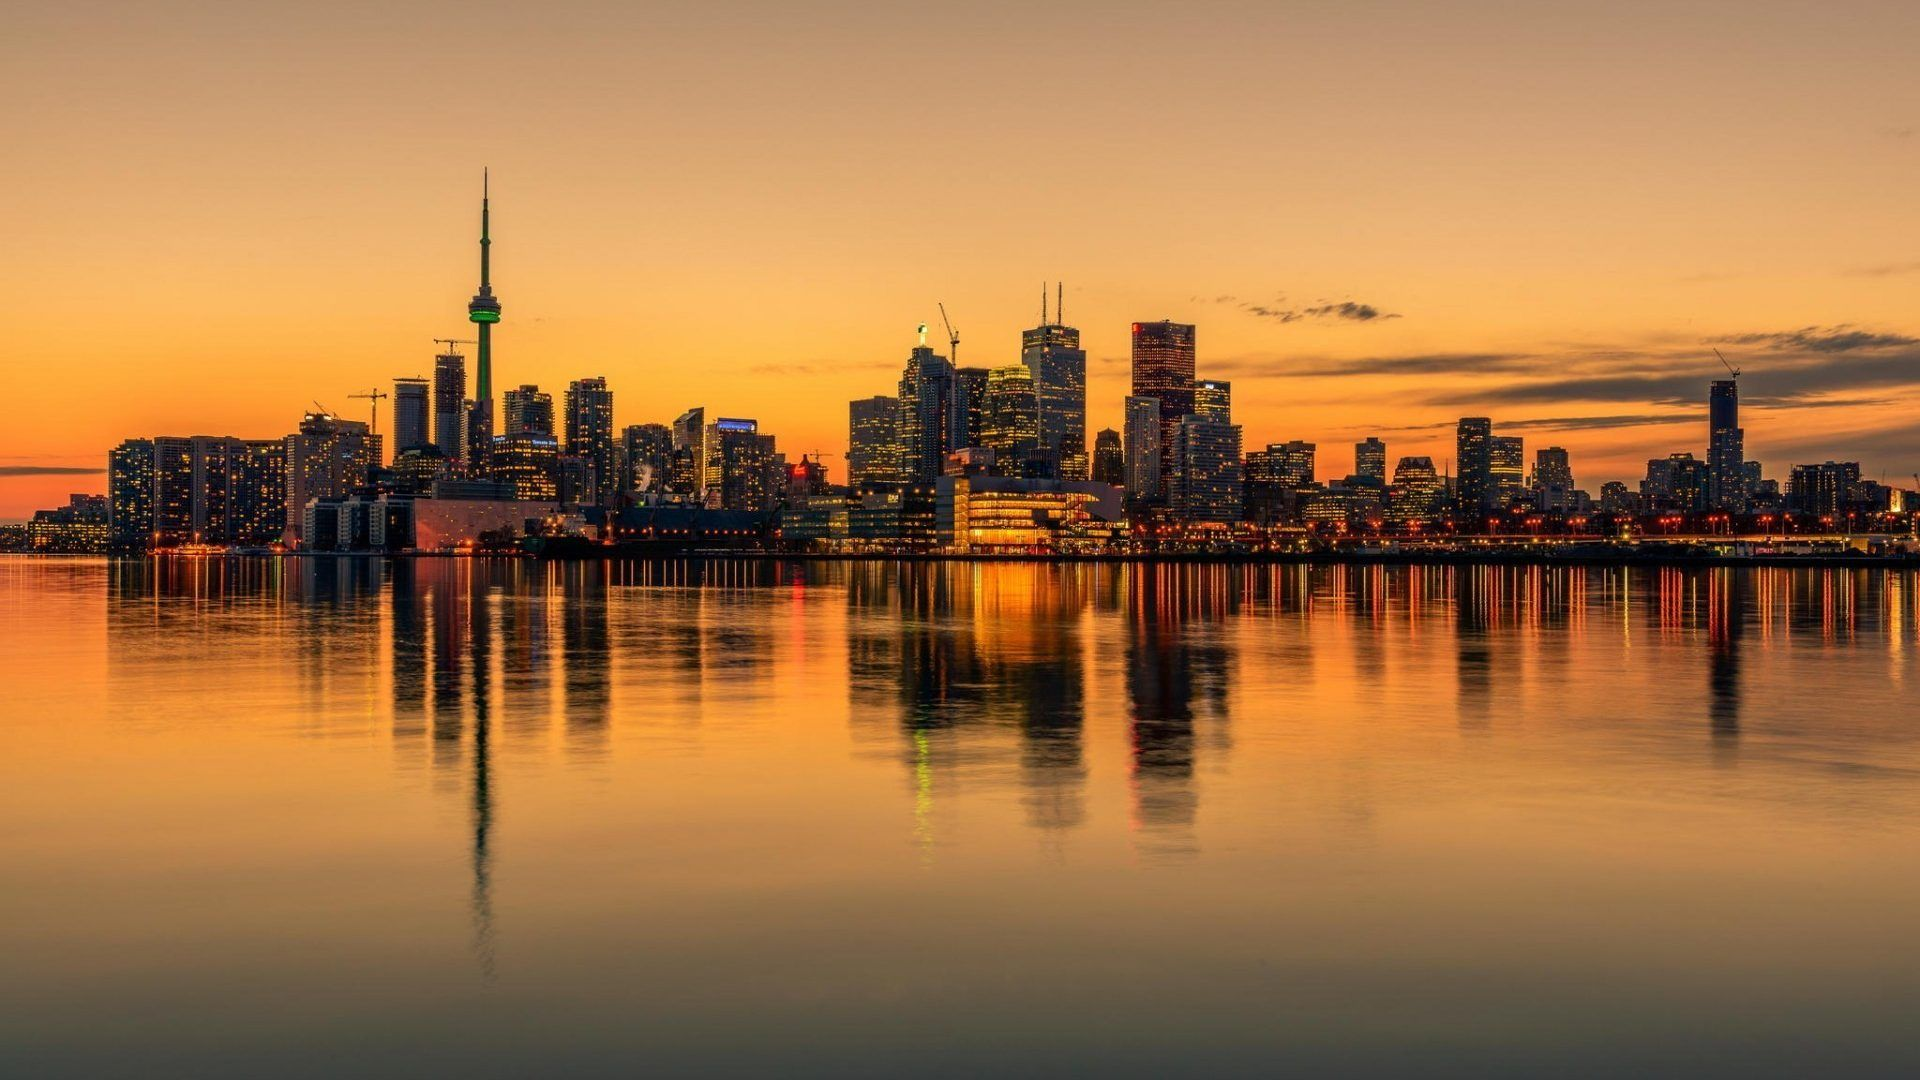 Toronto full hd image